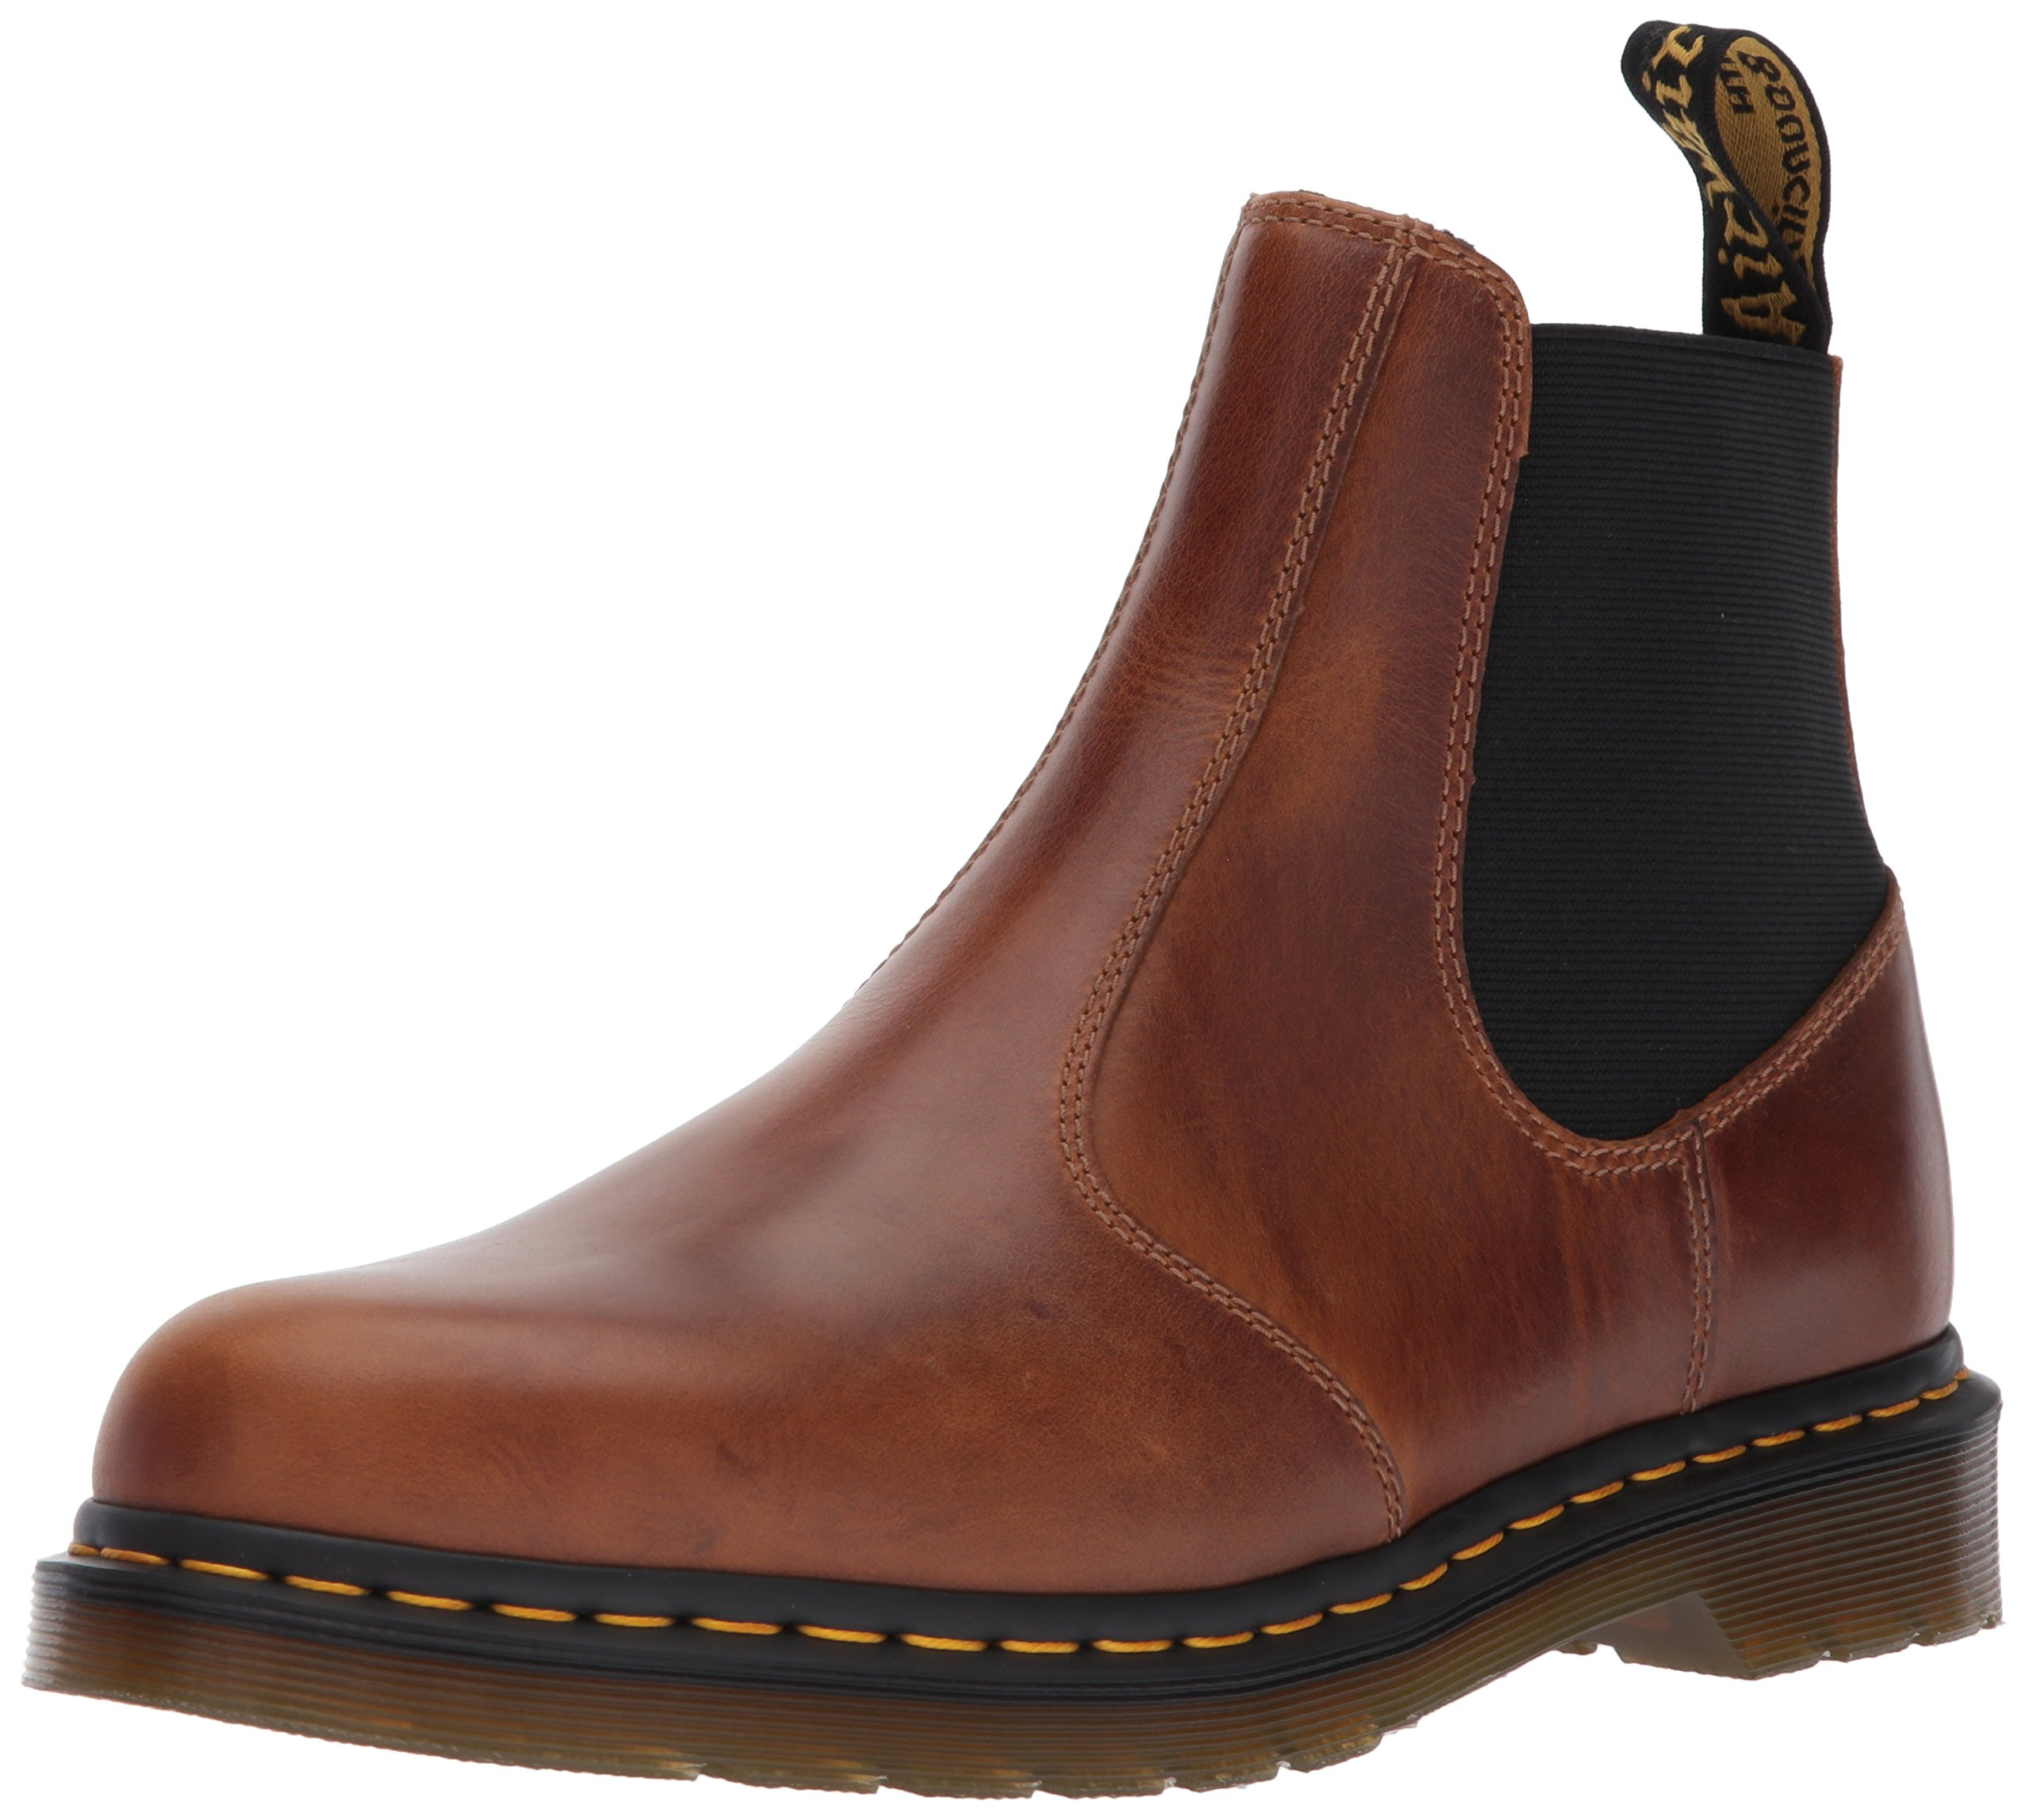 Dr. Martens Men's Hardy Chelsea Boot, Butterscotch, 7 Medium UK (8 US) by Dr. Martens